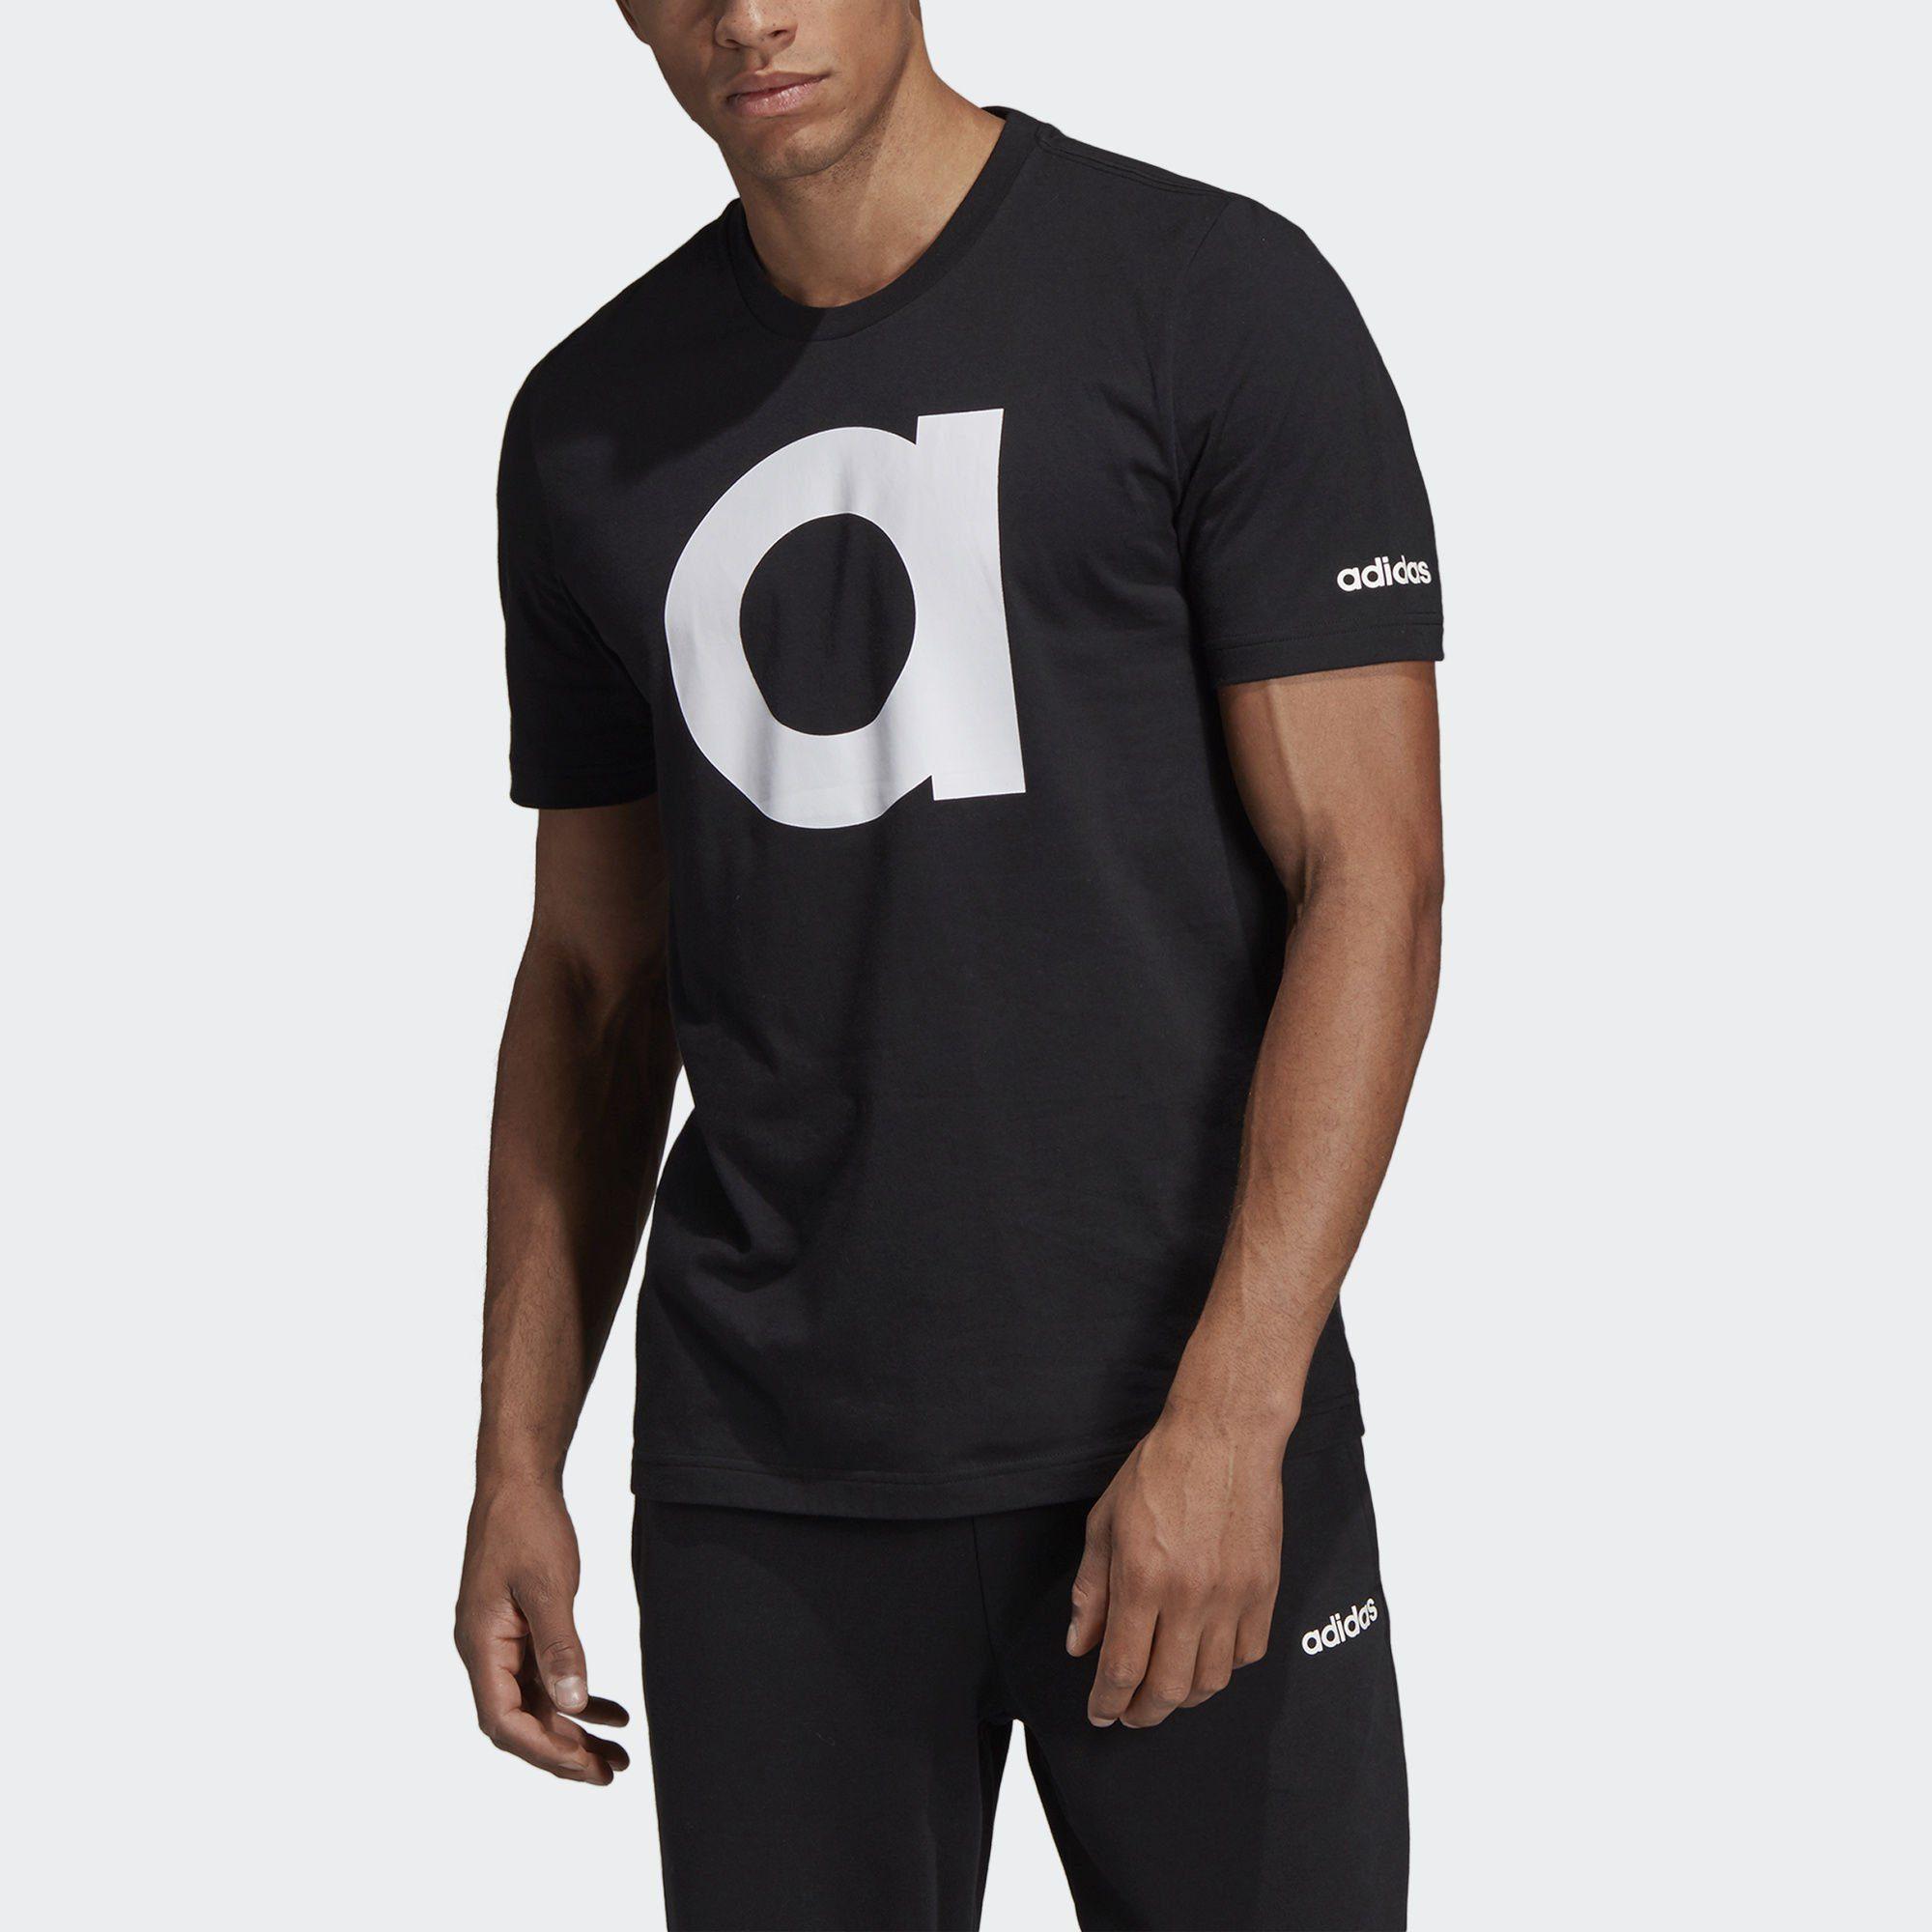 adidas Performance T-Shirt »Essentials T-Shirt« Essentials